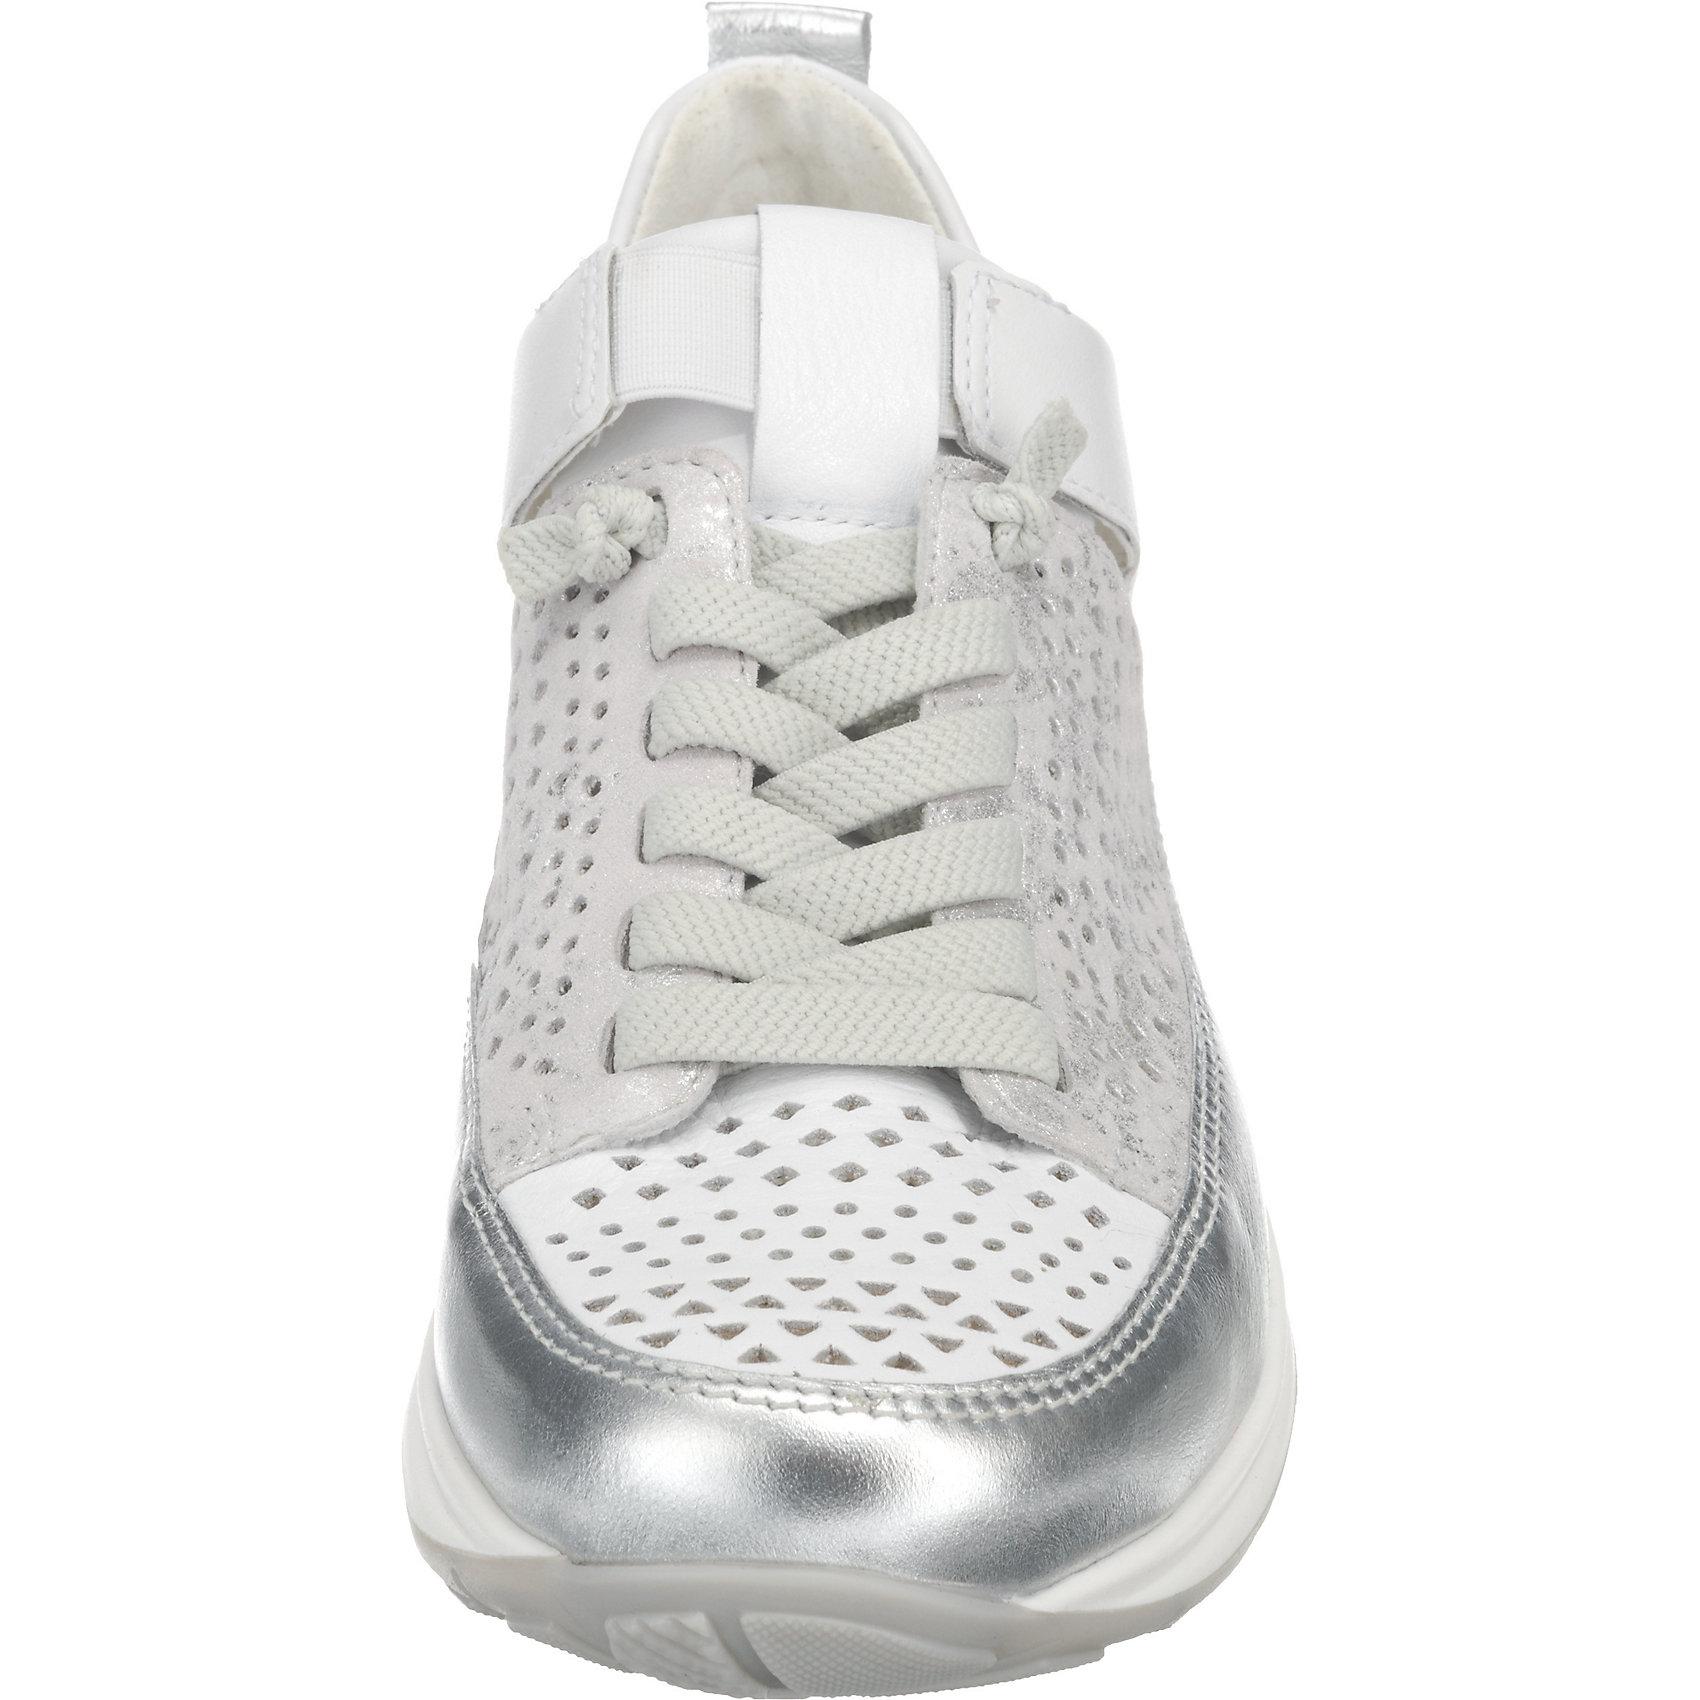 Neu ara Osaka Sneakers Low 7218201 für Damen silber